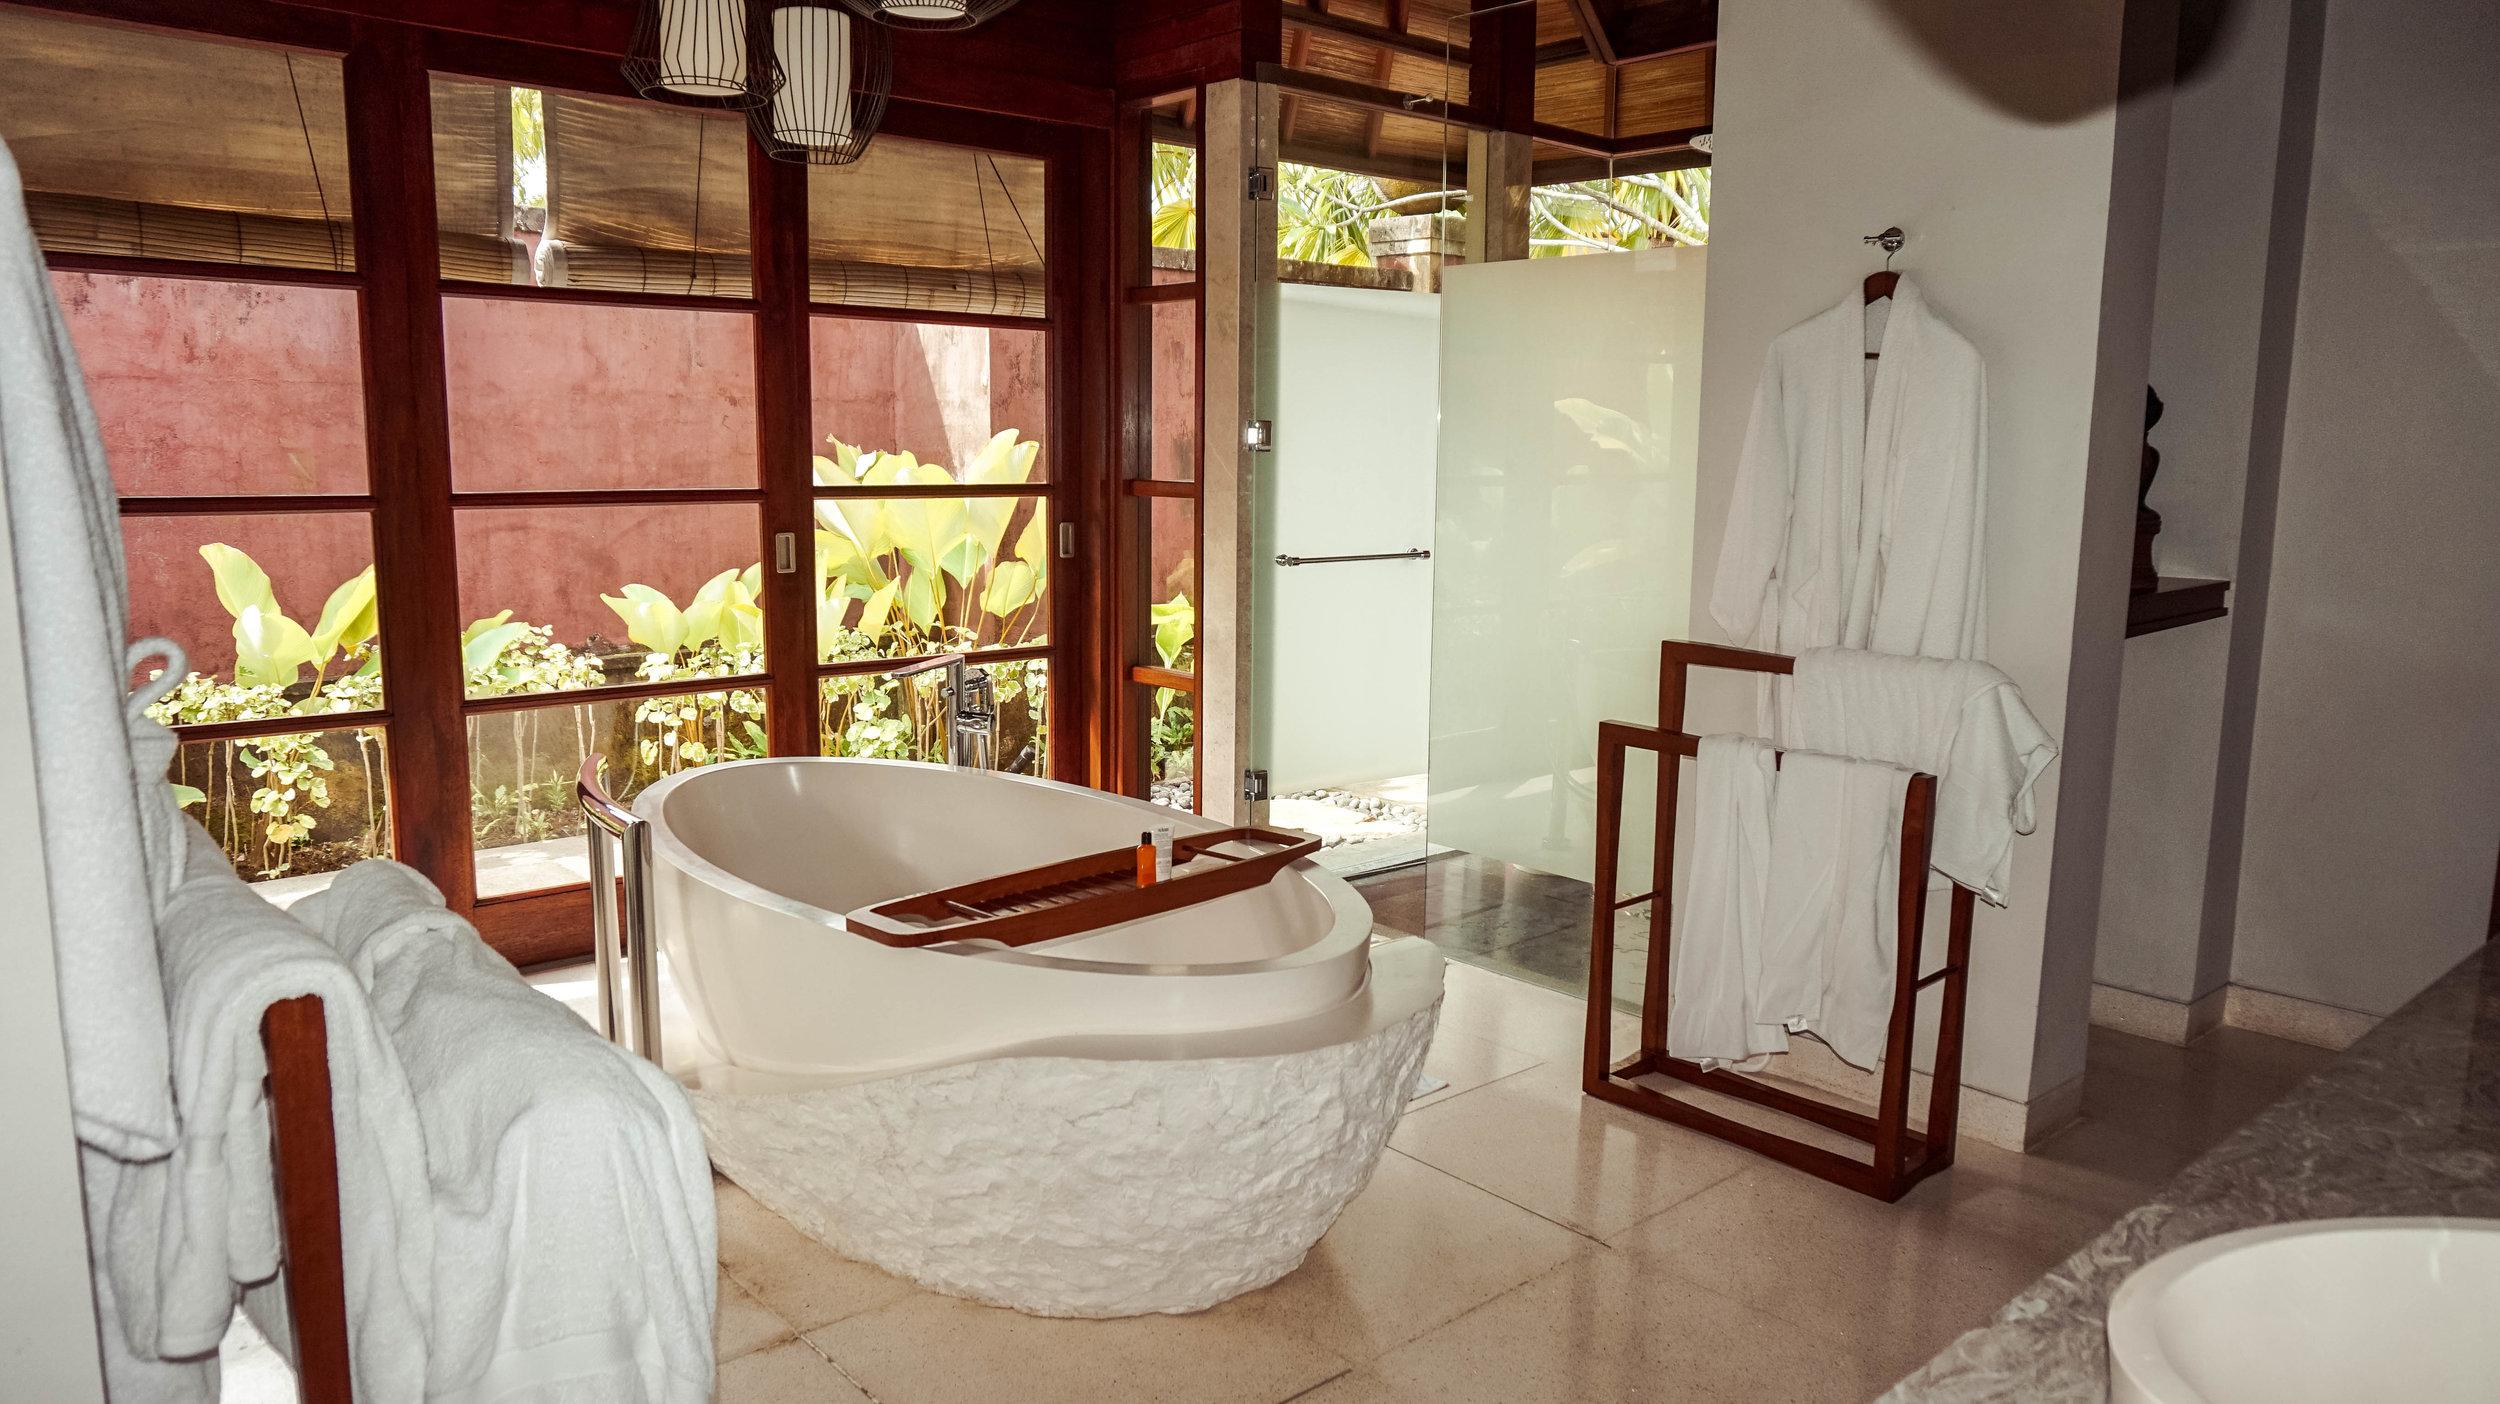 Hilton-bali-resort-1bedroom-bathroom.jpg